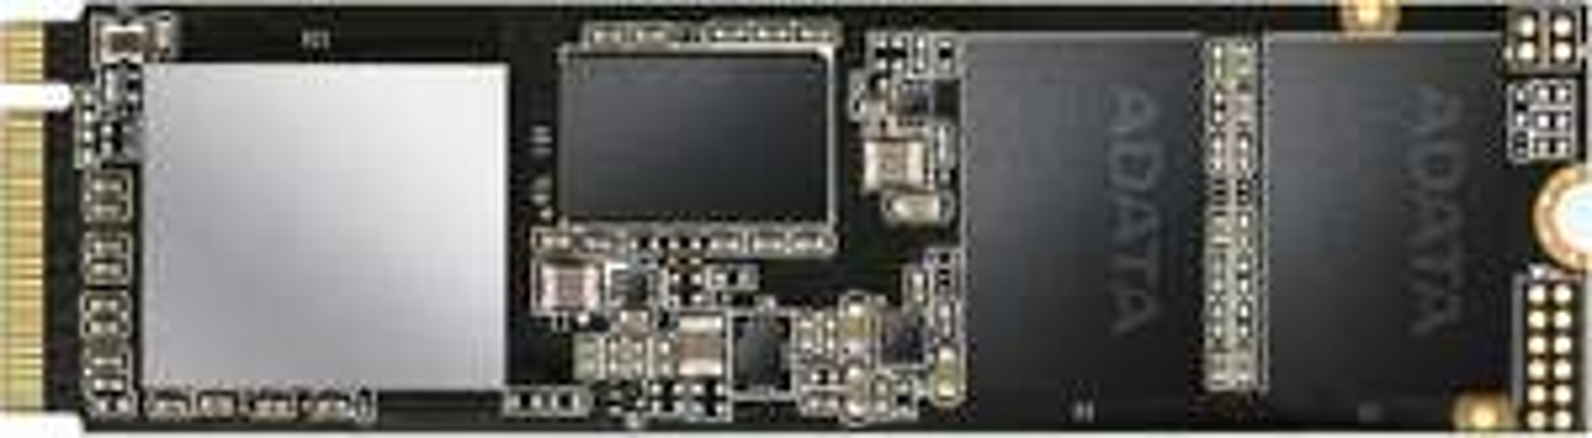 Adata SX8200 480GB